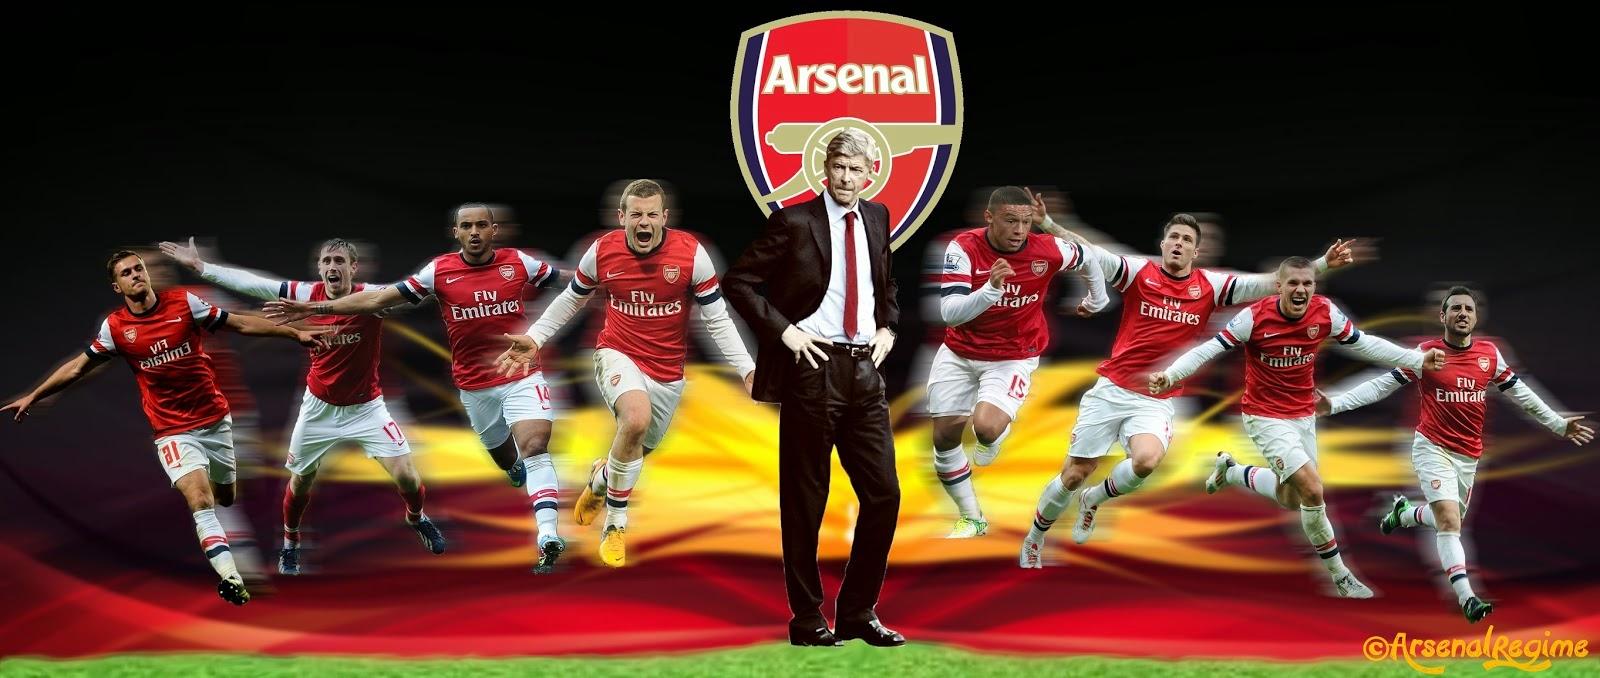 Arsenal Football Club Wallpaper Arsenal Players Pictures Download 1600x678 Download Hd Wallpaper Wallpapertip